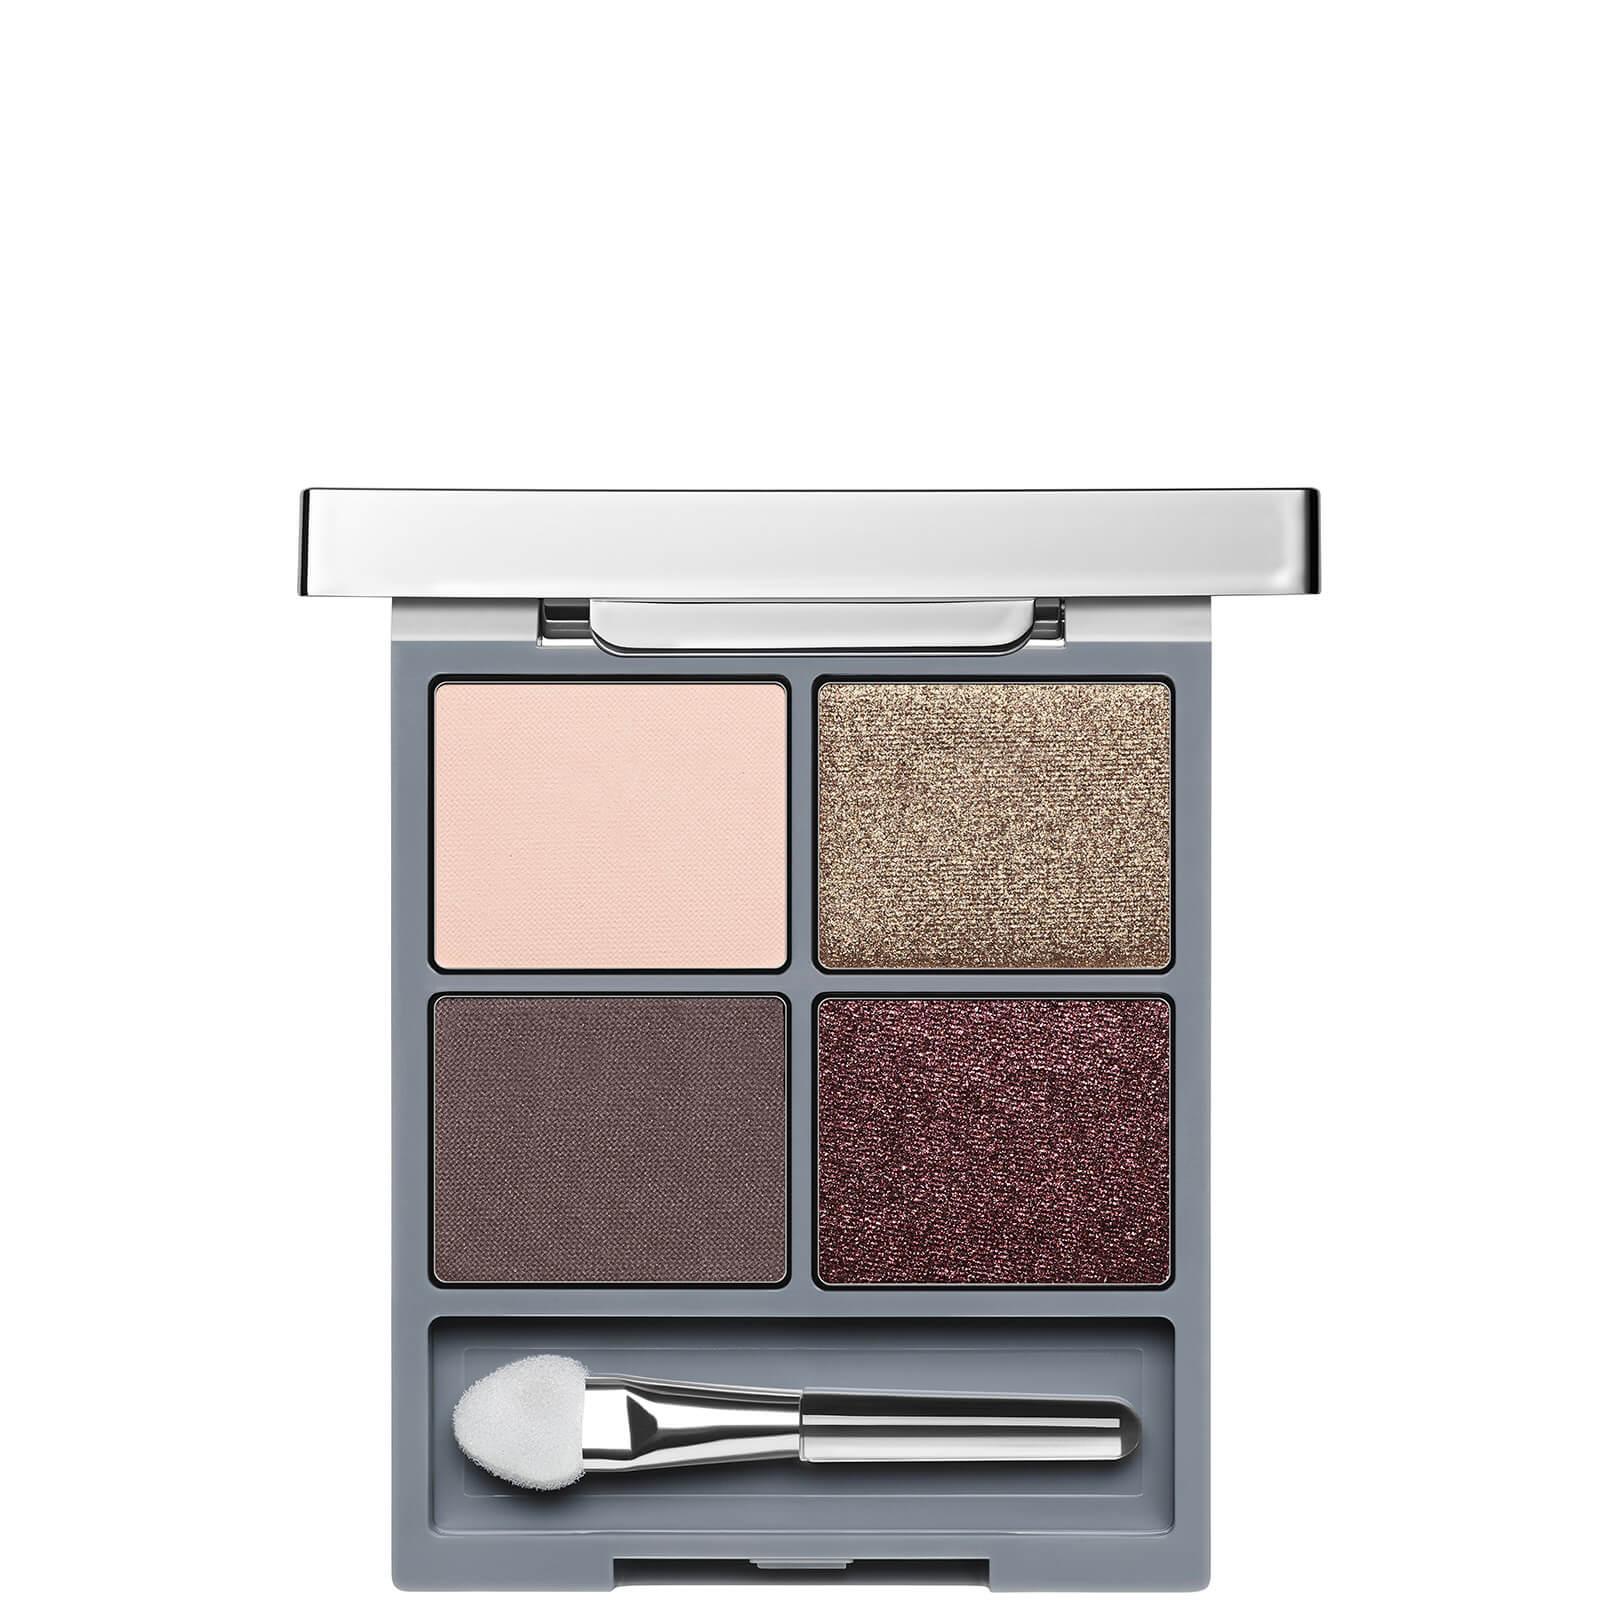 Physicians Formula The Healthy Eyeshadow 6g (Various Shades) - Smoky Plum